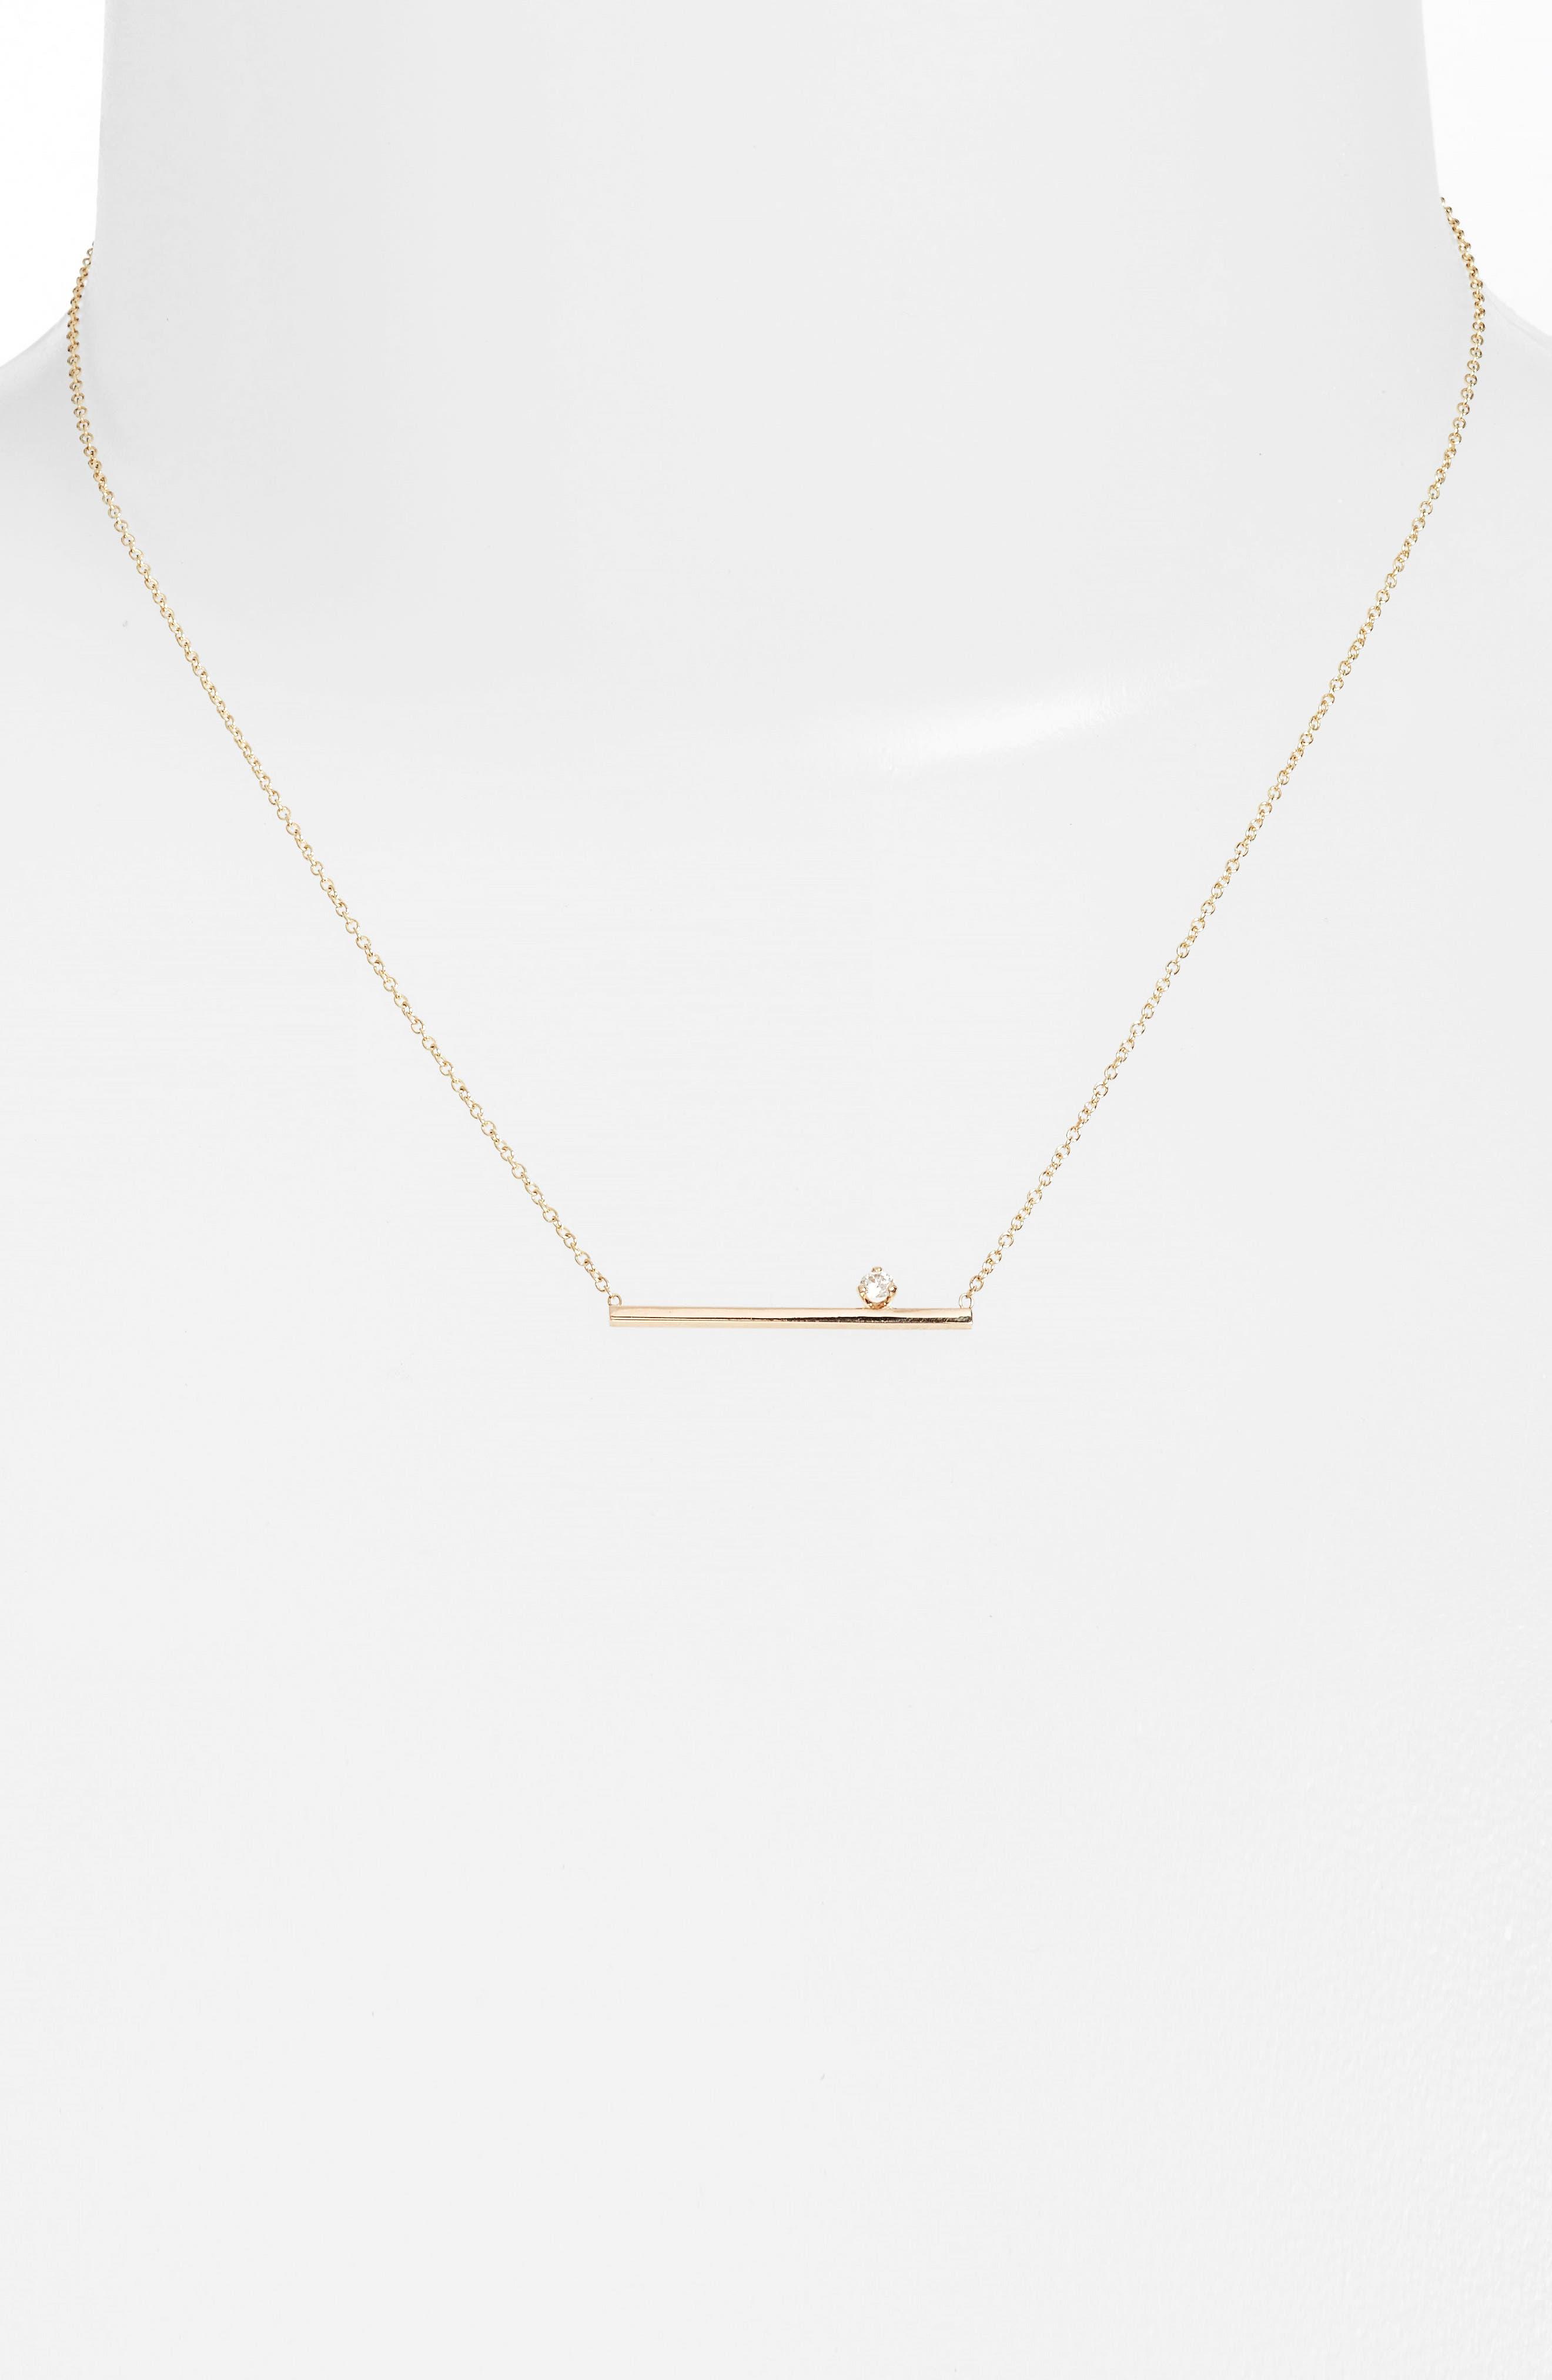 Zoë Chicco Floating Diamond Pendant Necklace